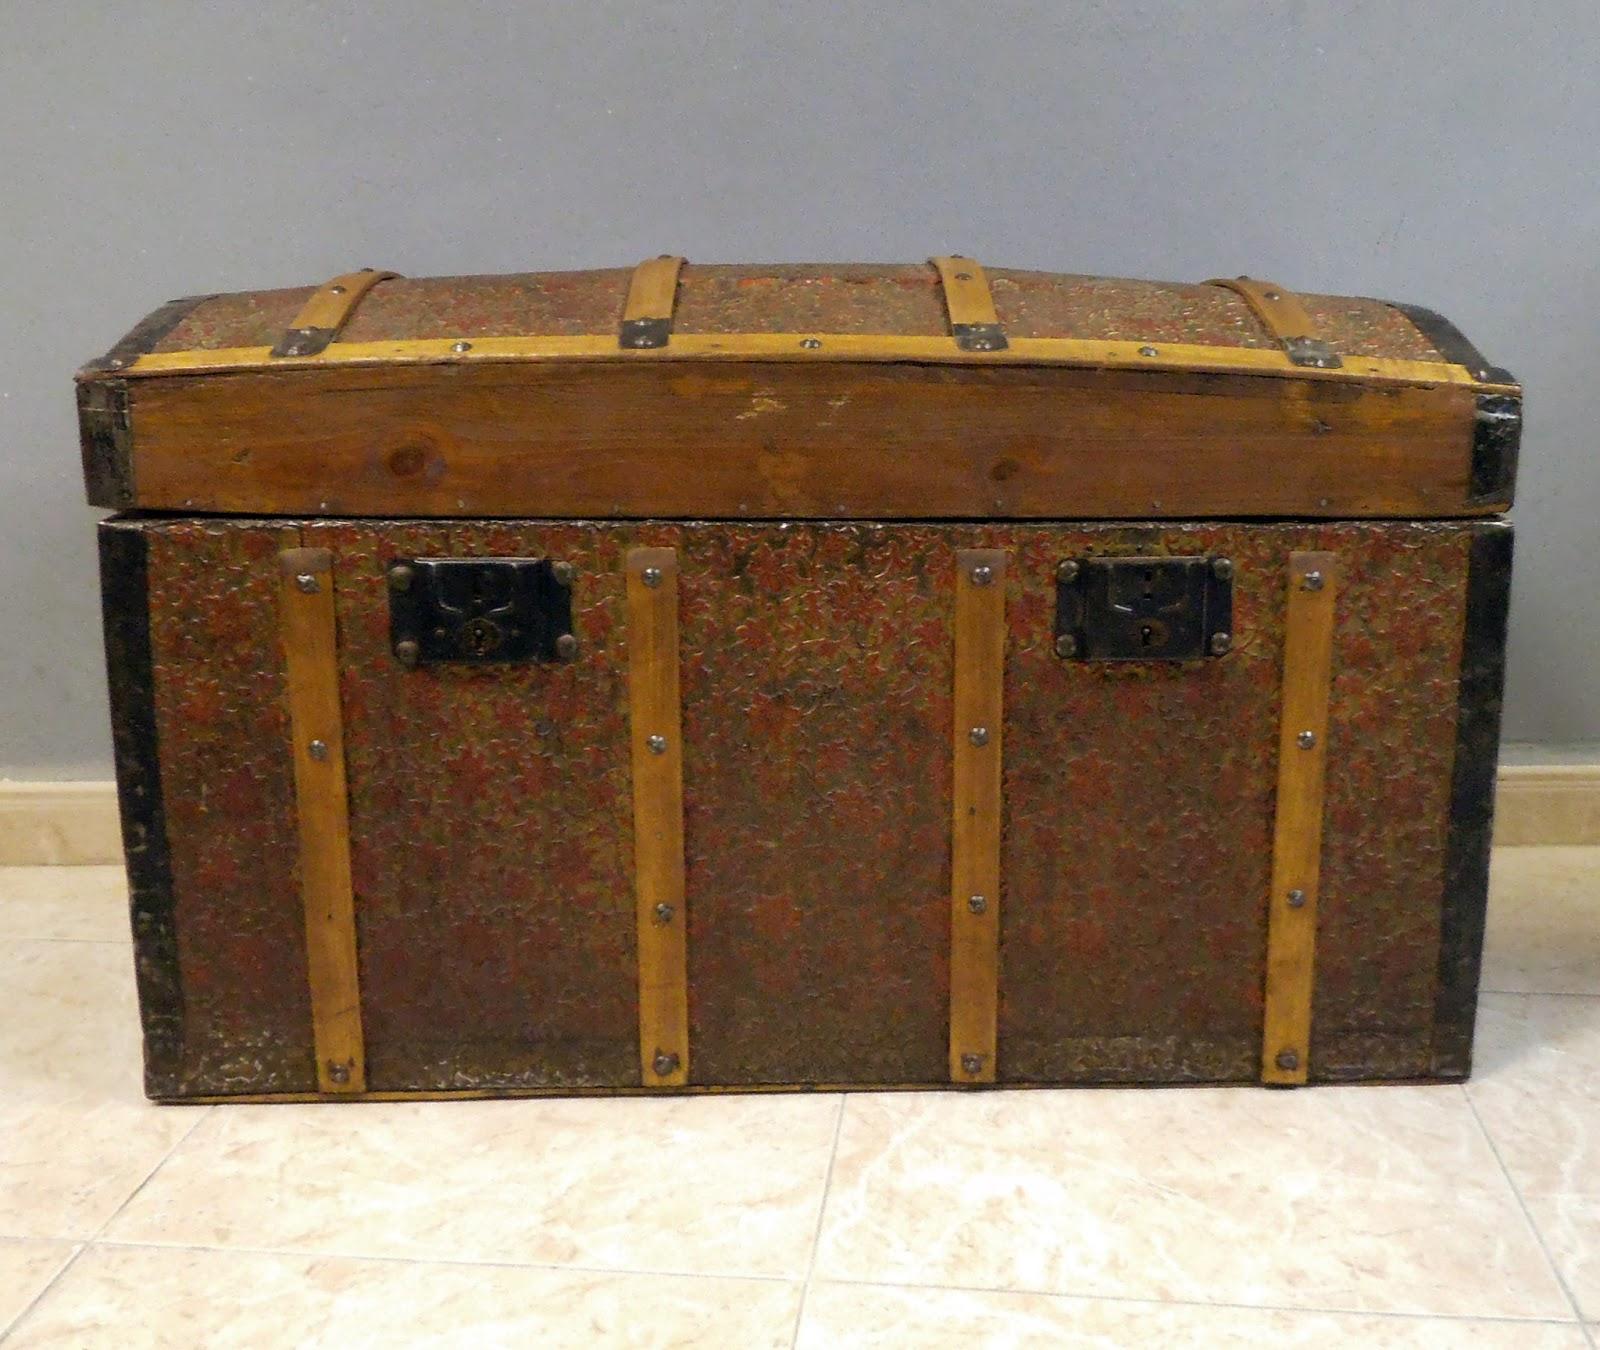 Renovarte muebles curso de restauraci n de muebles ba l for Cursos de restauracion de muebles en madrid